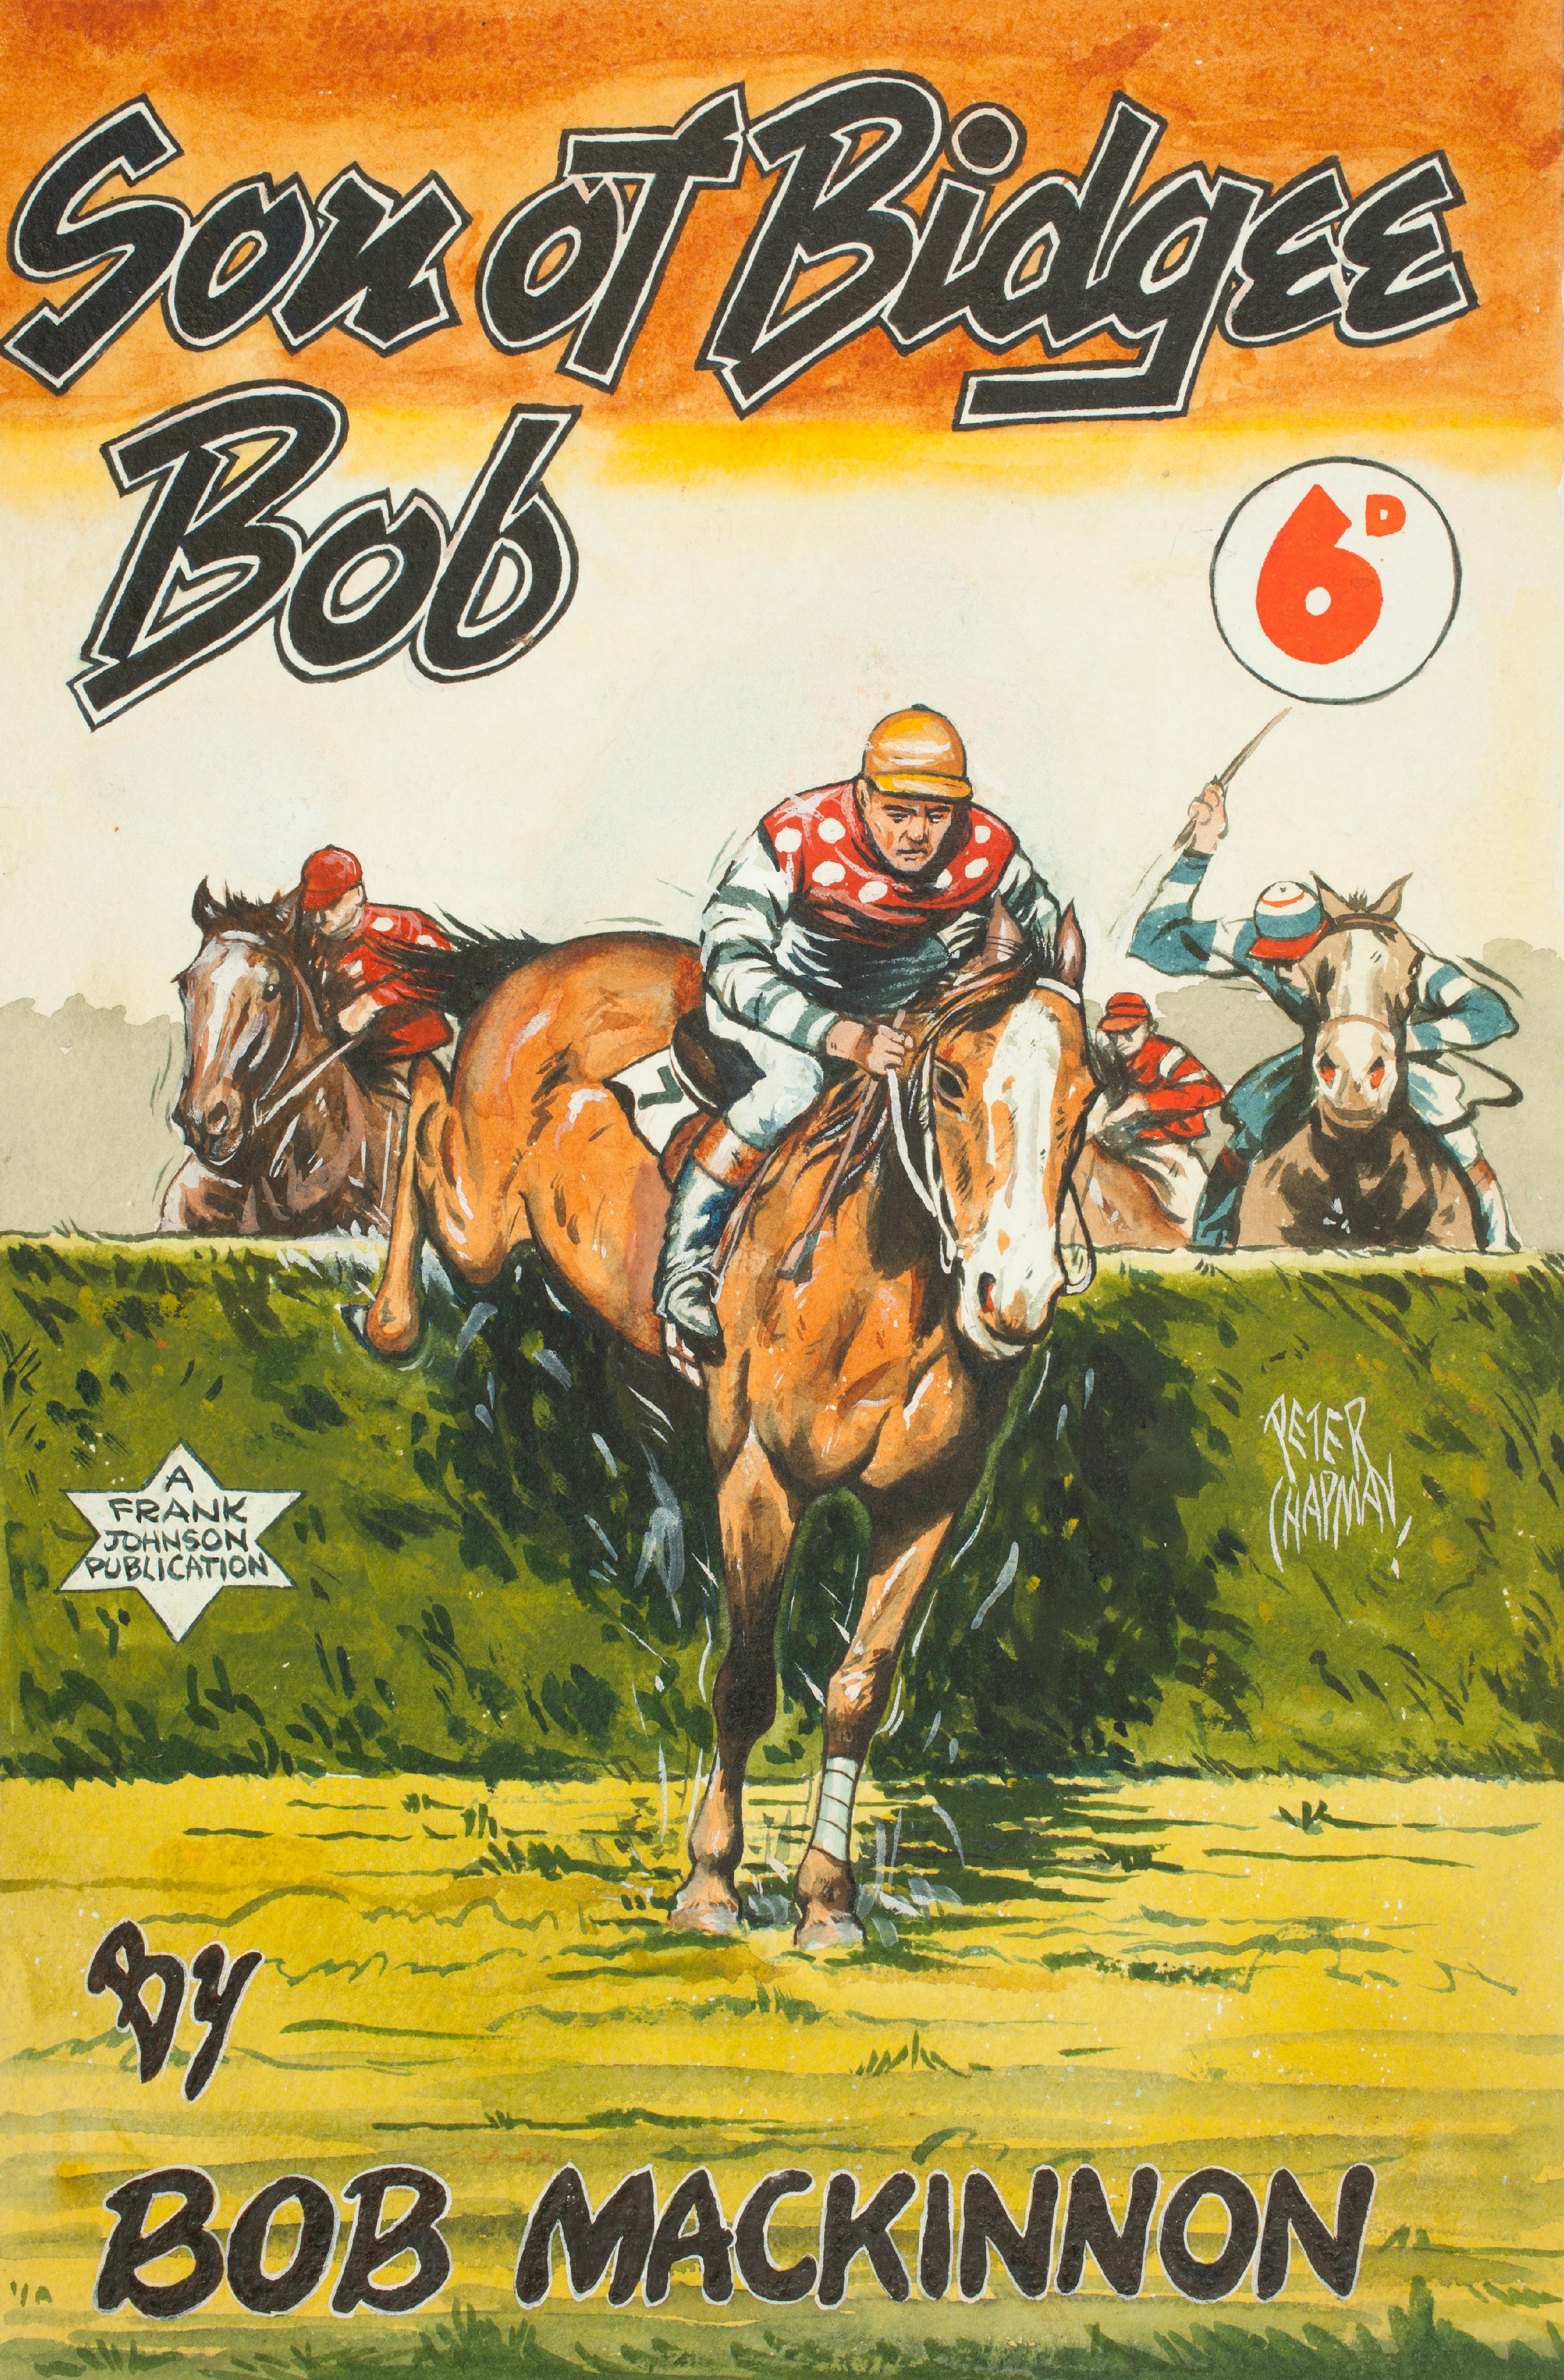 Son of Bidgee Bob 1947, cover art Peter Chapman,